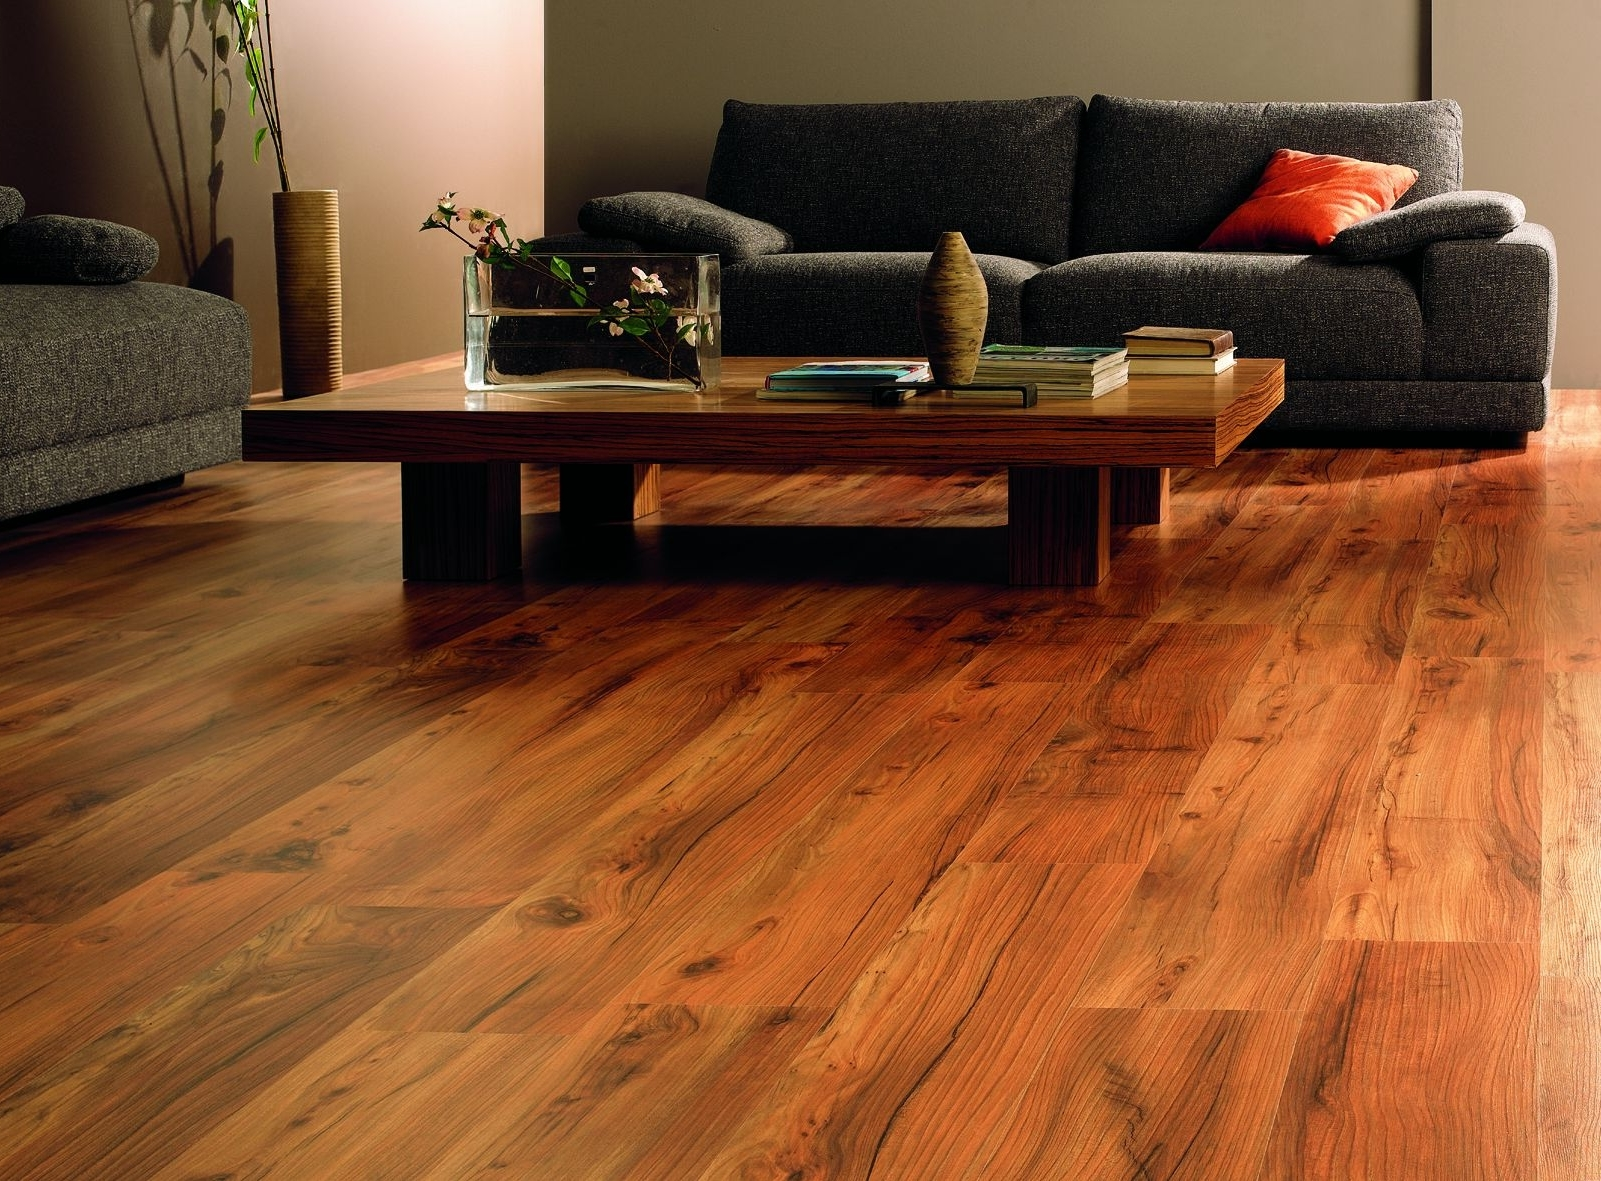 Best-Vinyl-Wooden-Living-Room-Flooring - Granite & More